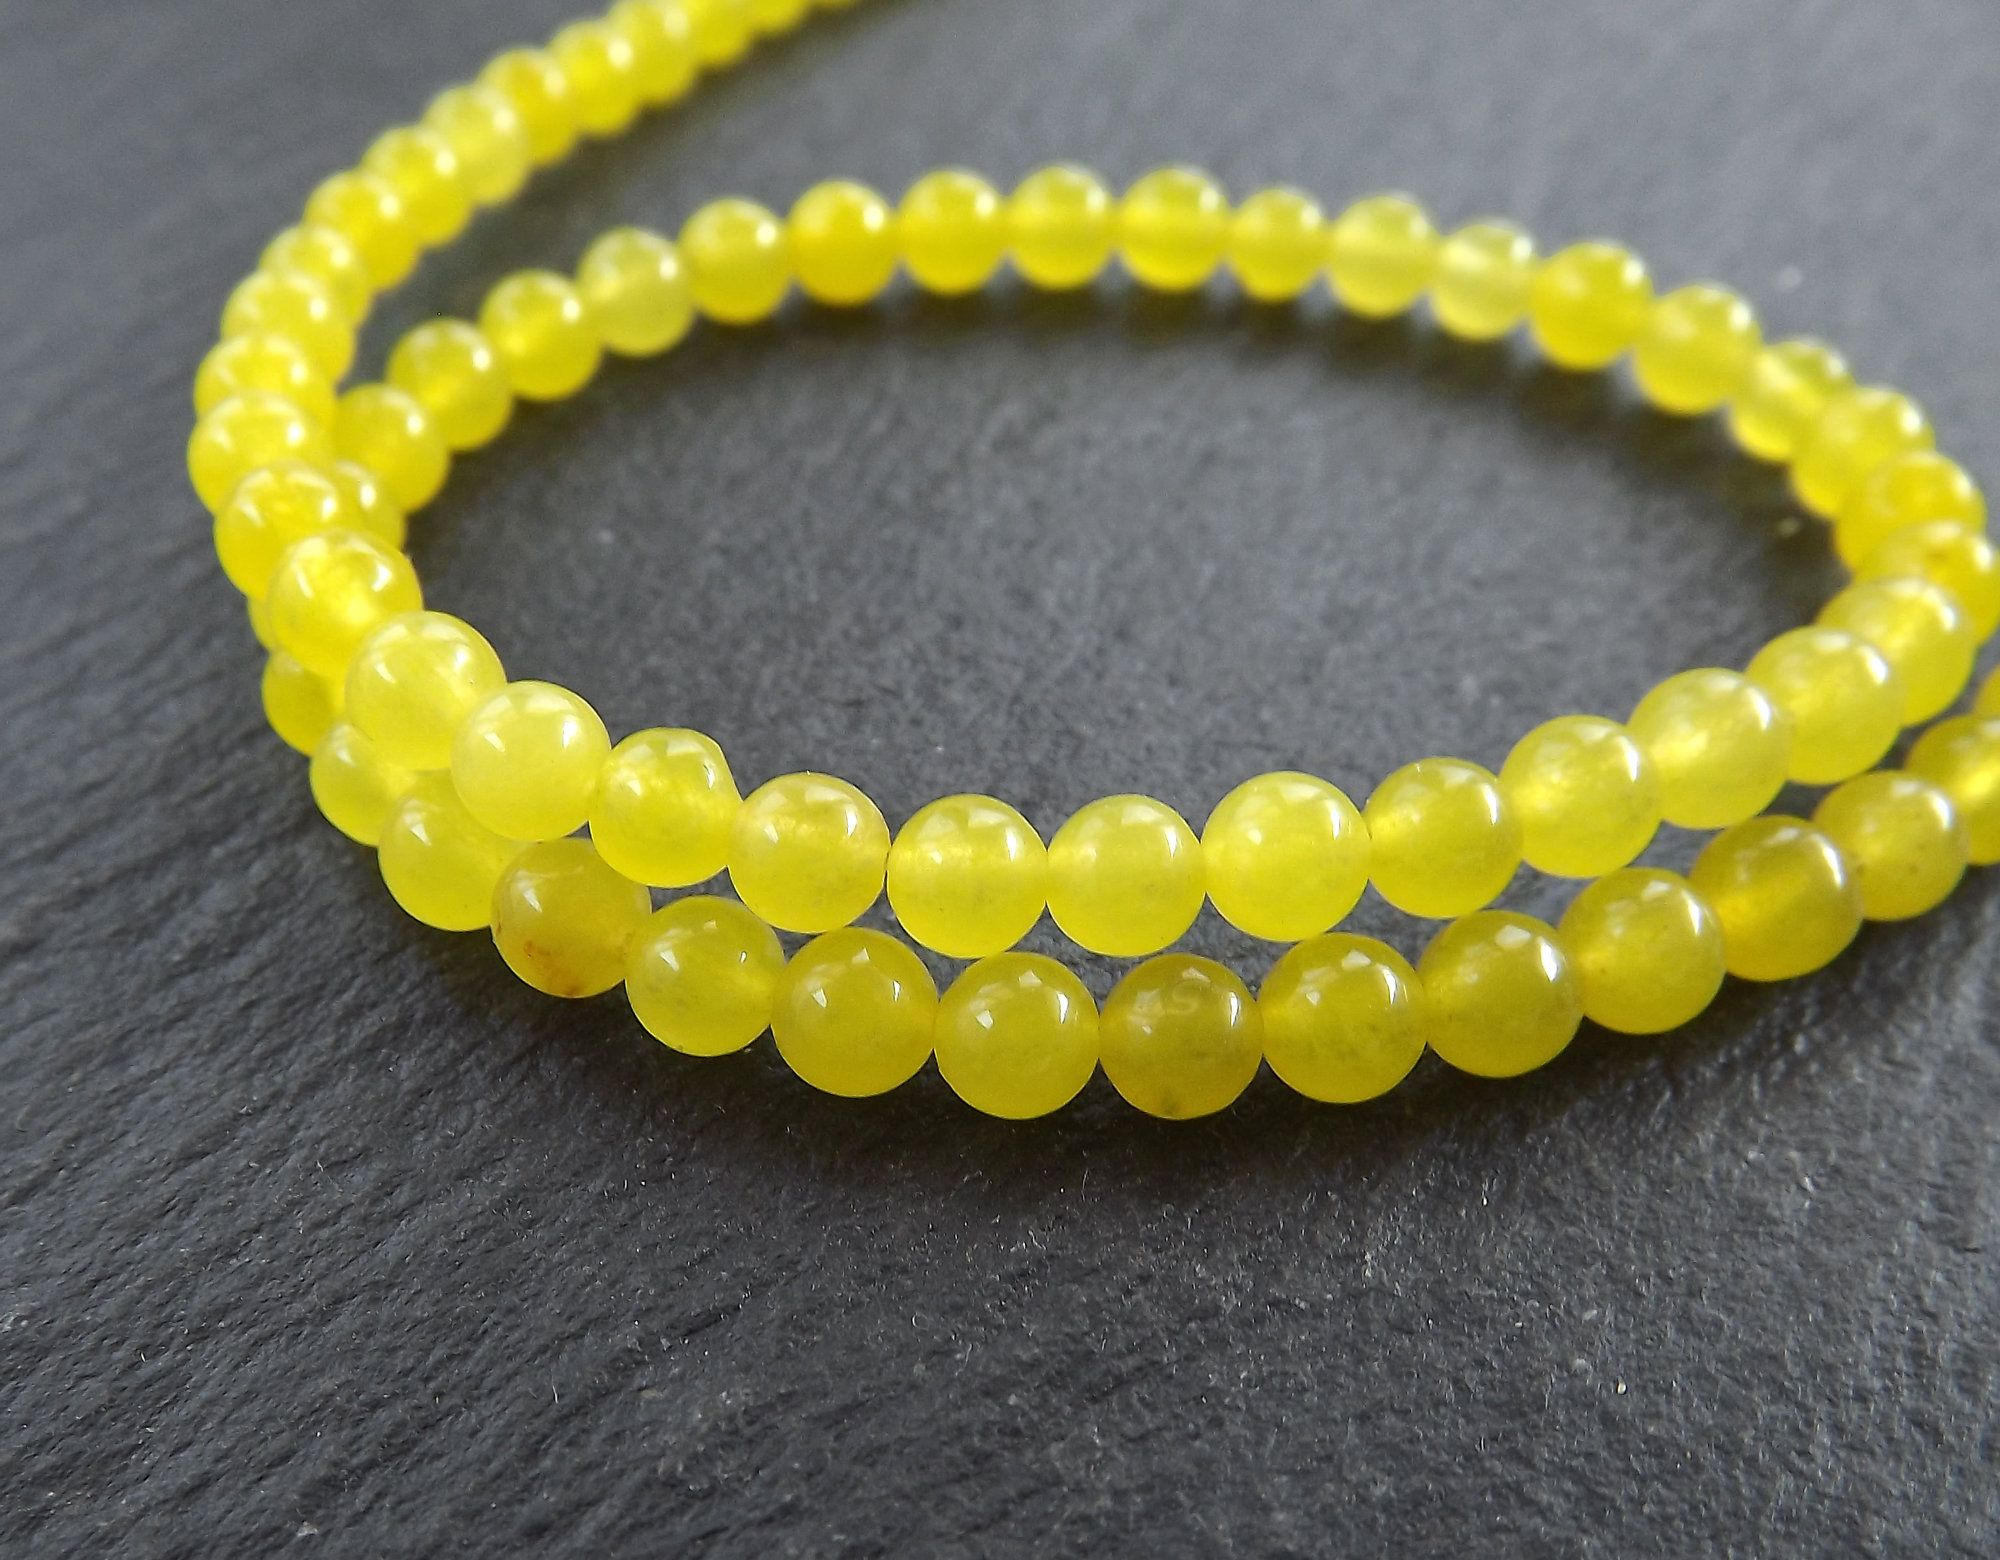 Jewelry Crafts Natural Topaz Smooth Tyre Beads handmade,8 mm Topaz Beads Amazing White Topaz Smooth Tyre Shape Gemstone Beads,13 Strand